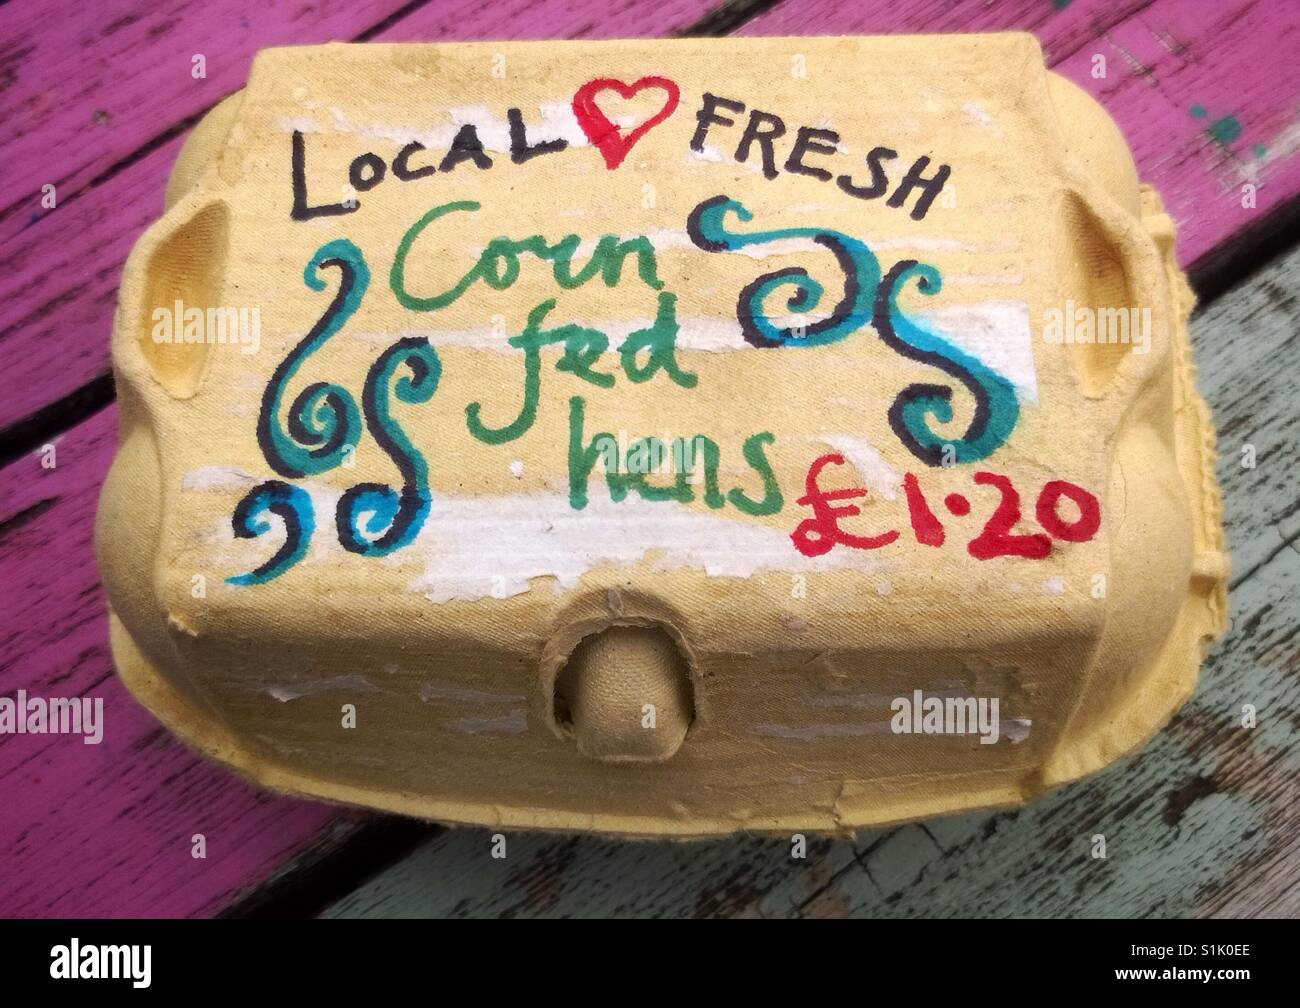 Shopping Local Farm Fresh Eggs Stock Photo 310818774 Alamy